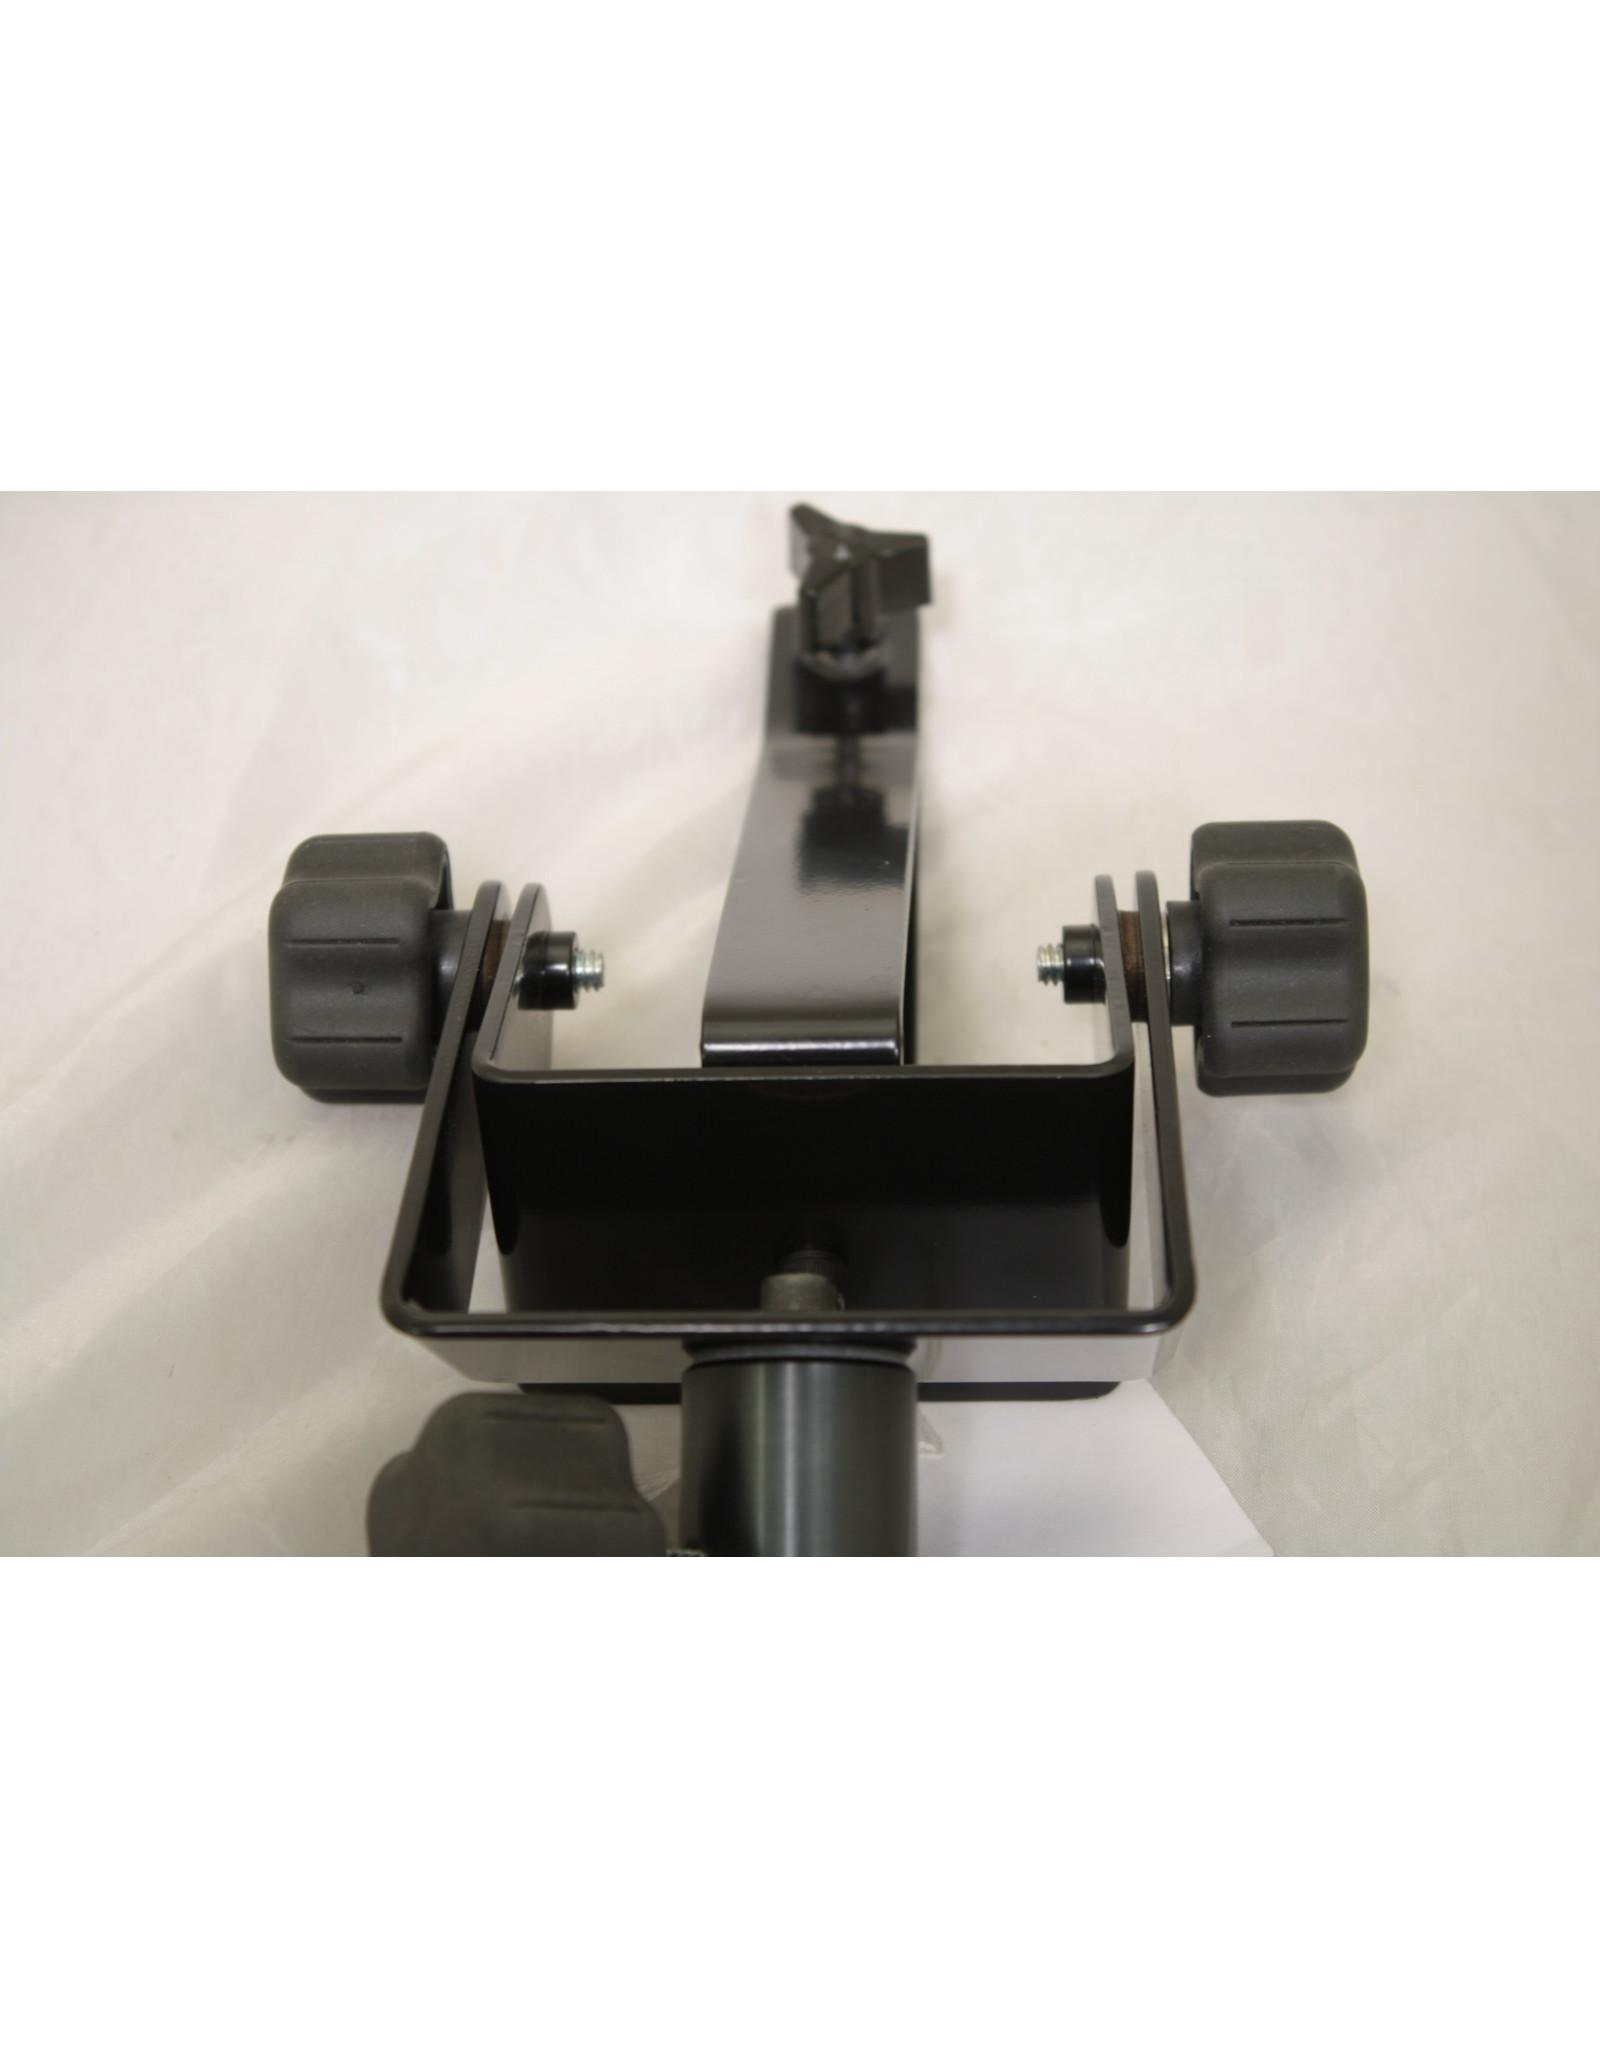 Binocular Tripod Mount (Pre-owned)